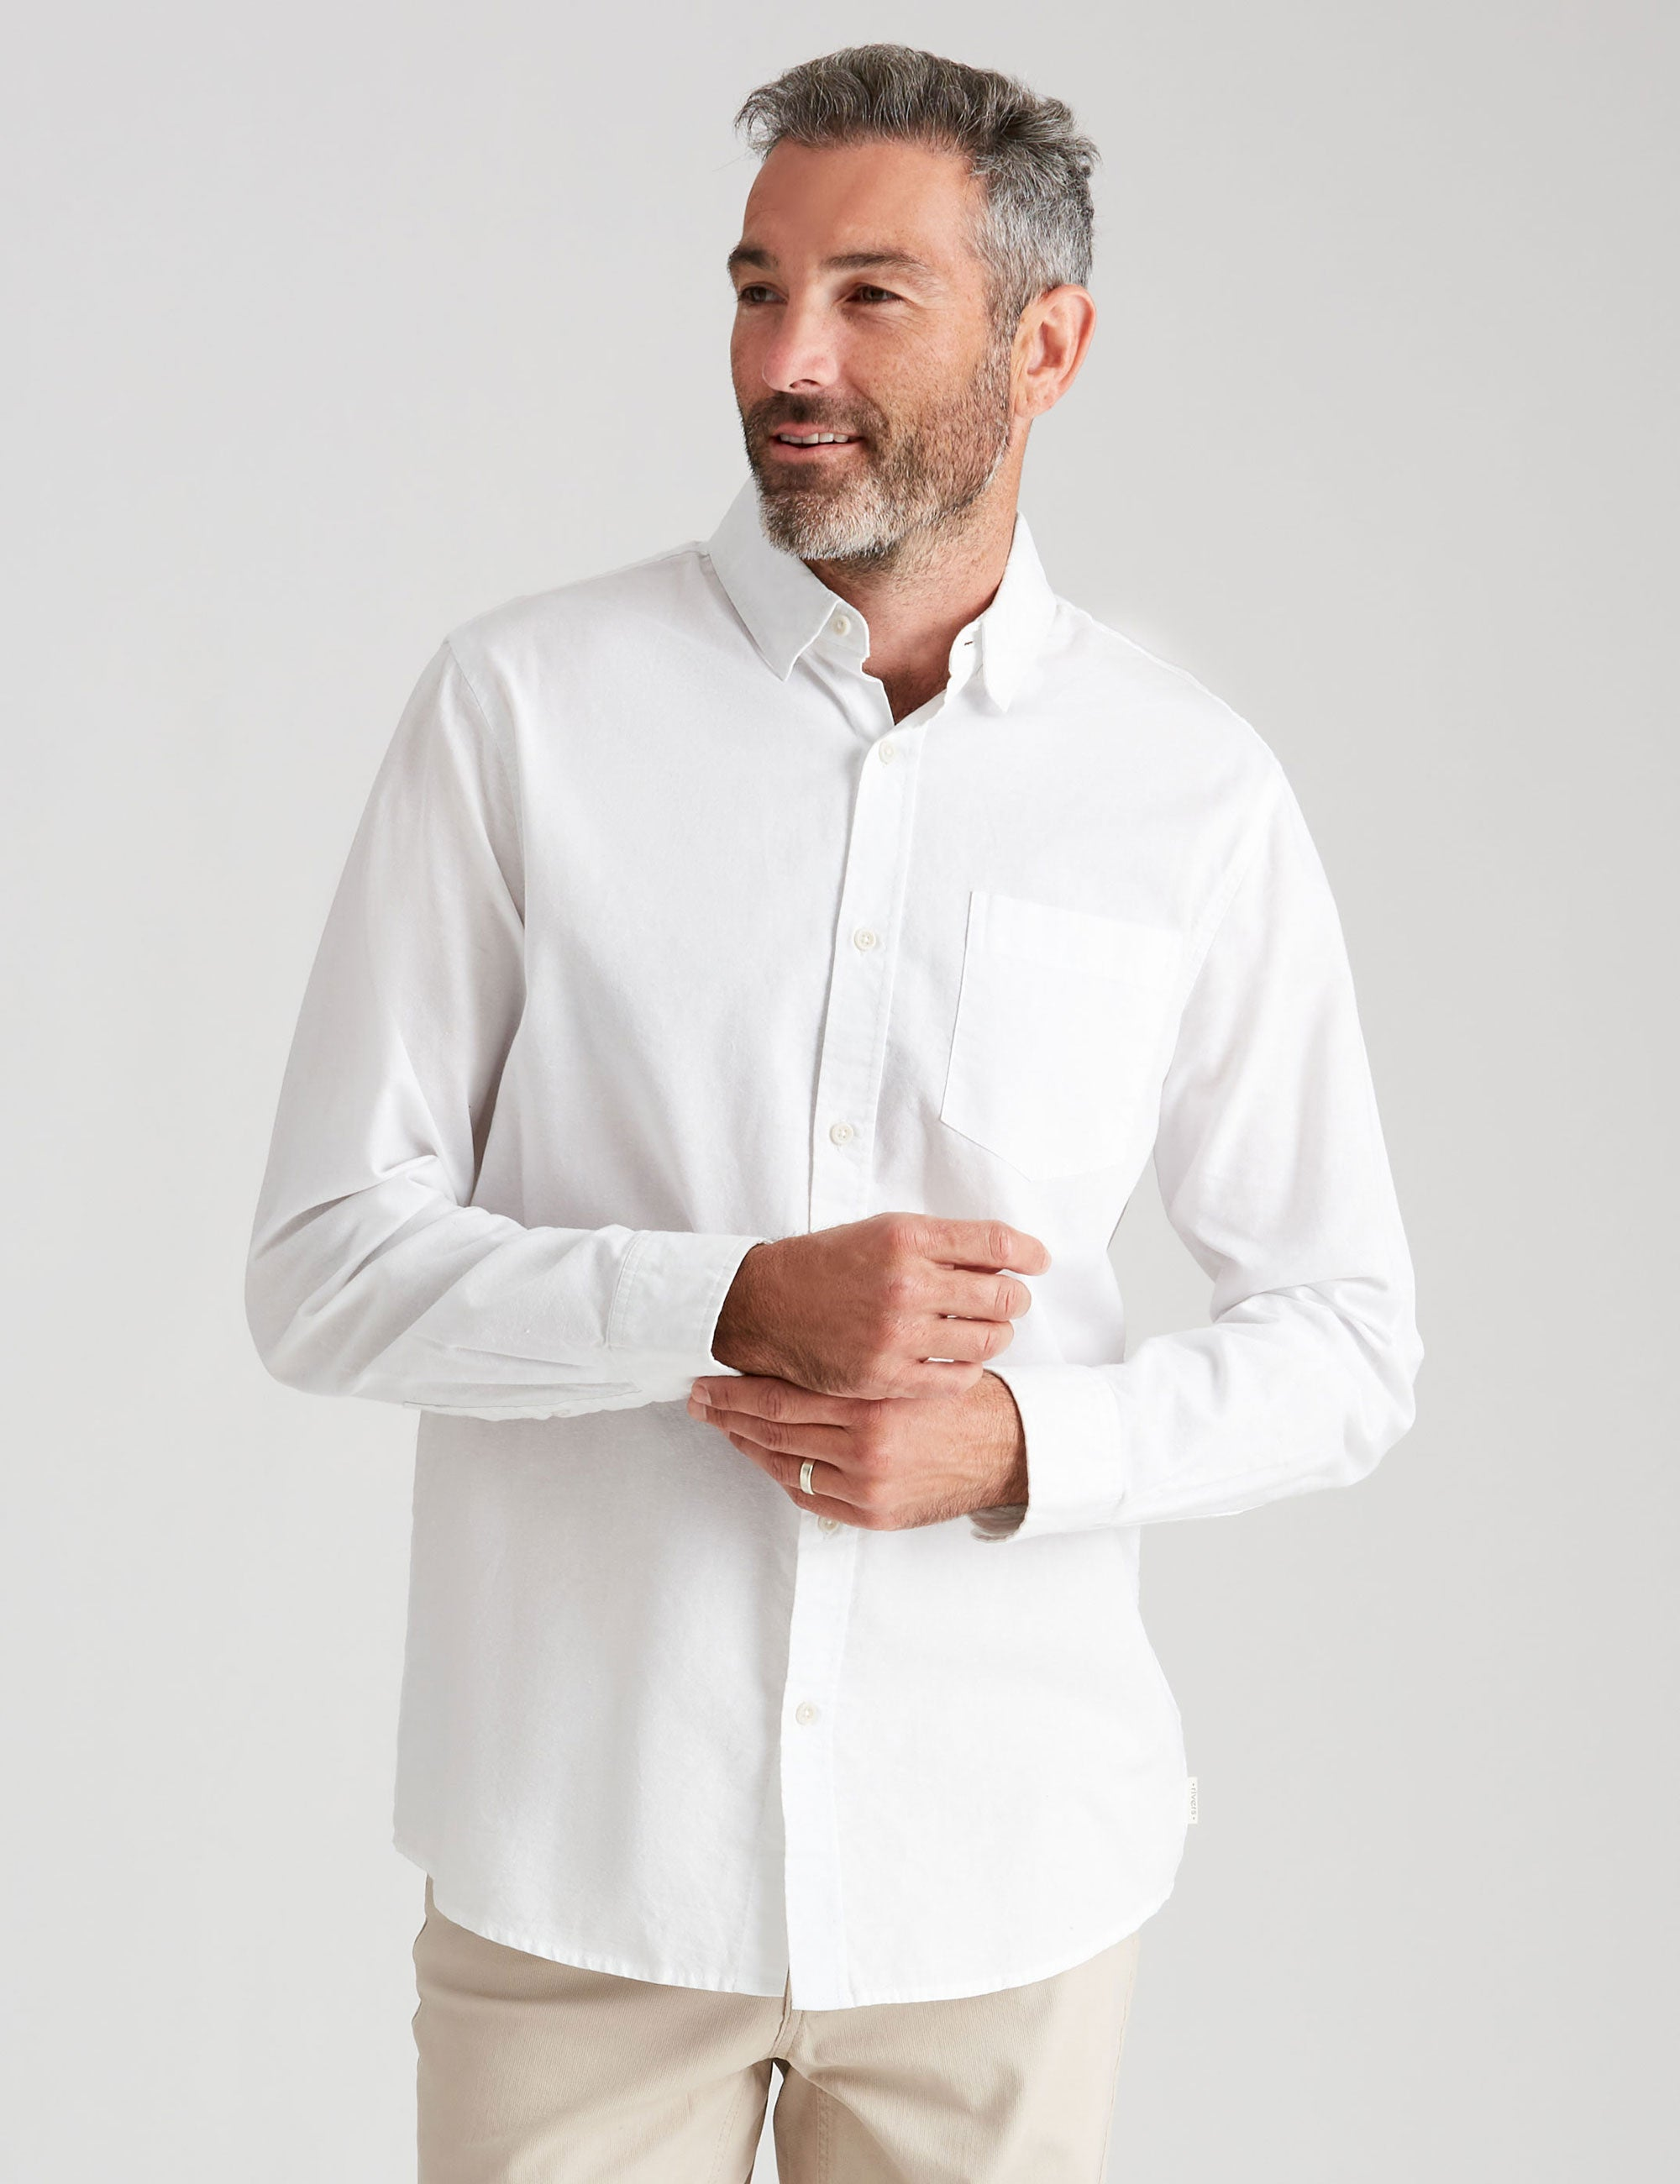 UlanLi Multicolor Printing Mens All Over Print Short Sleeve Shirt//Large Size